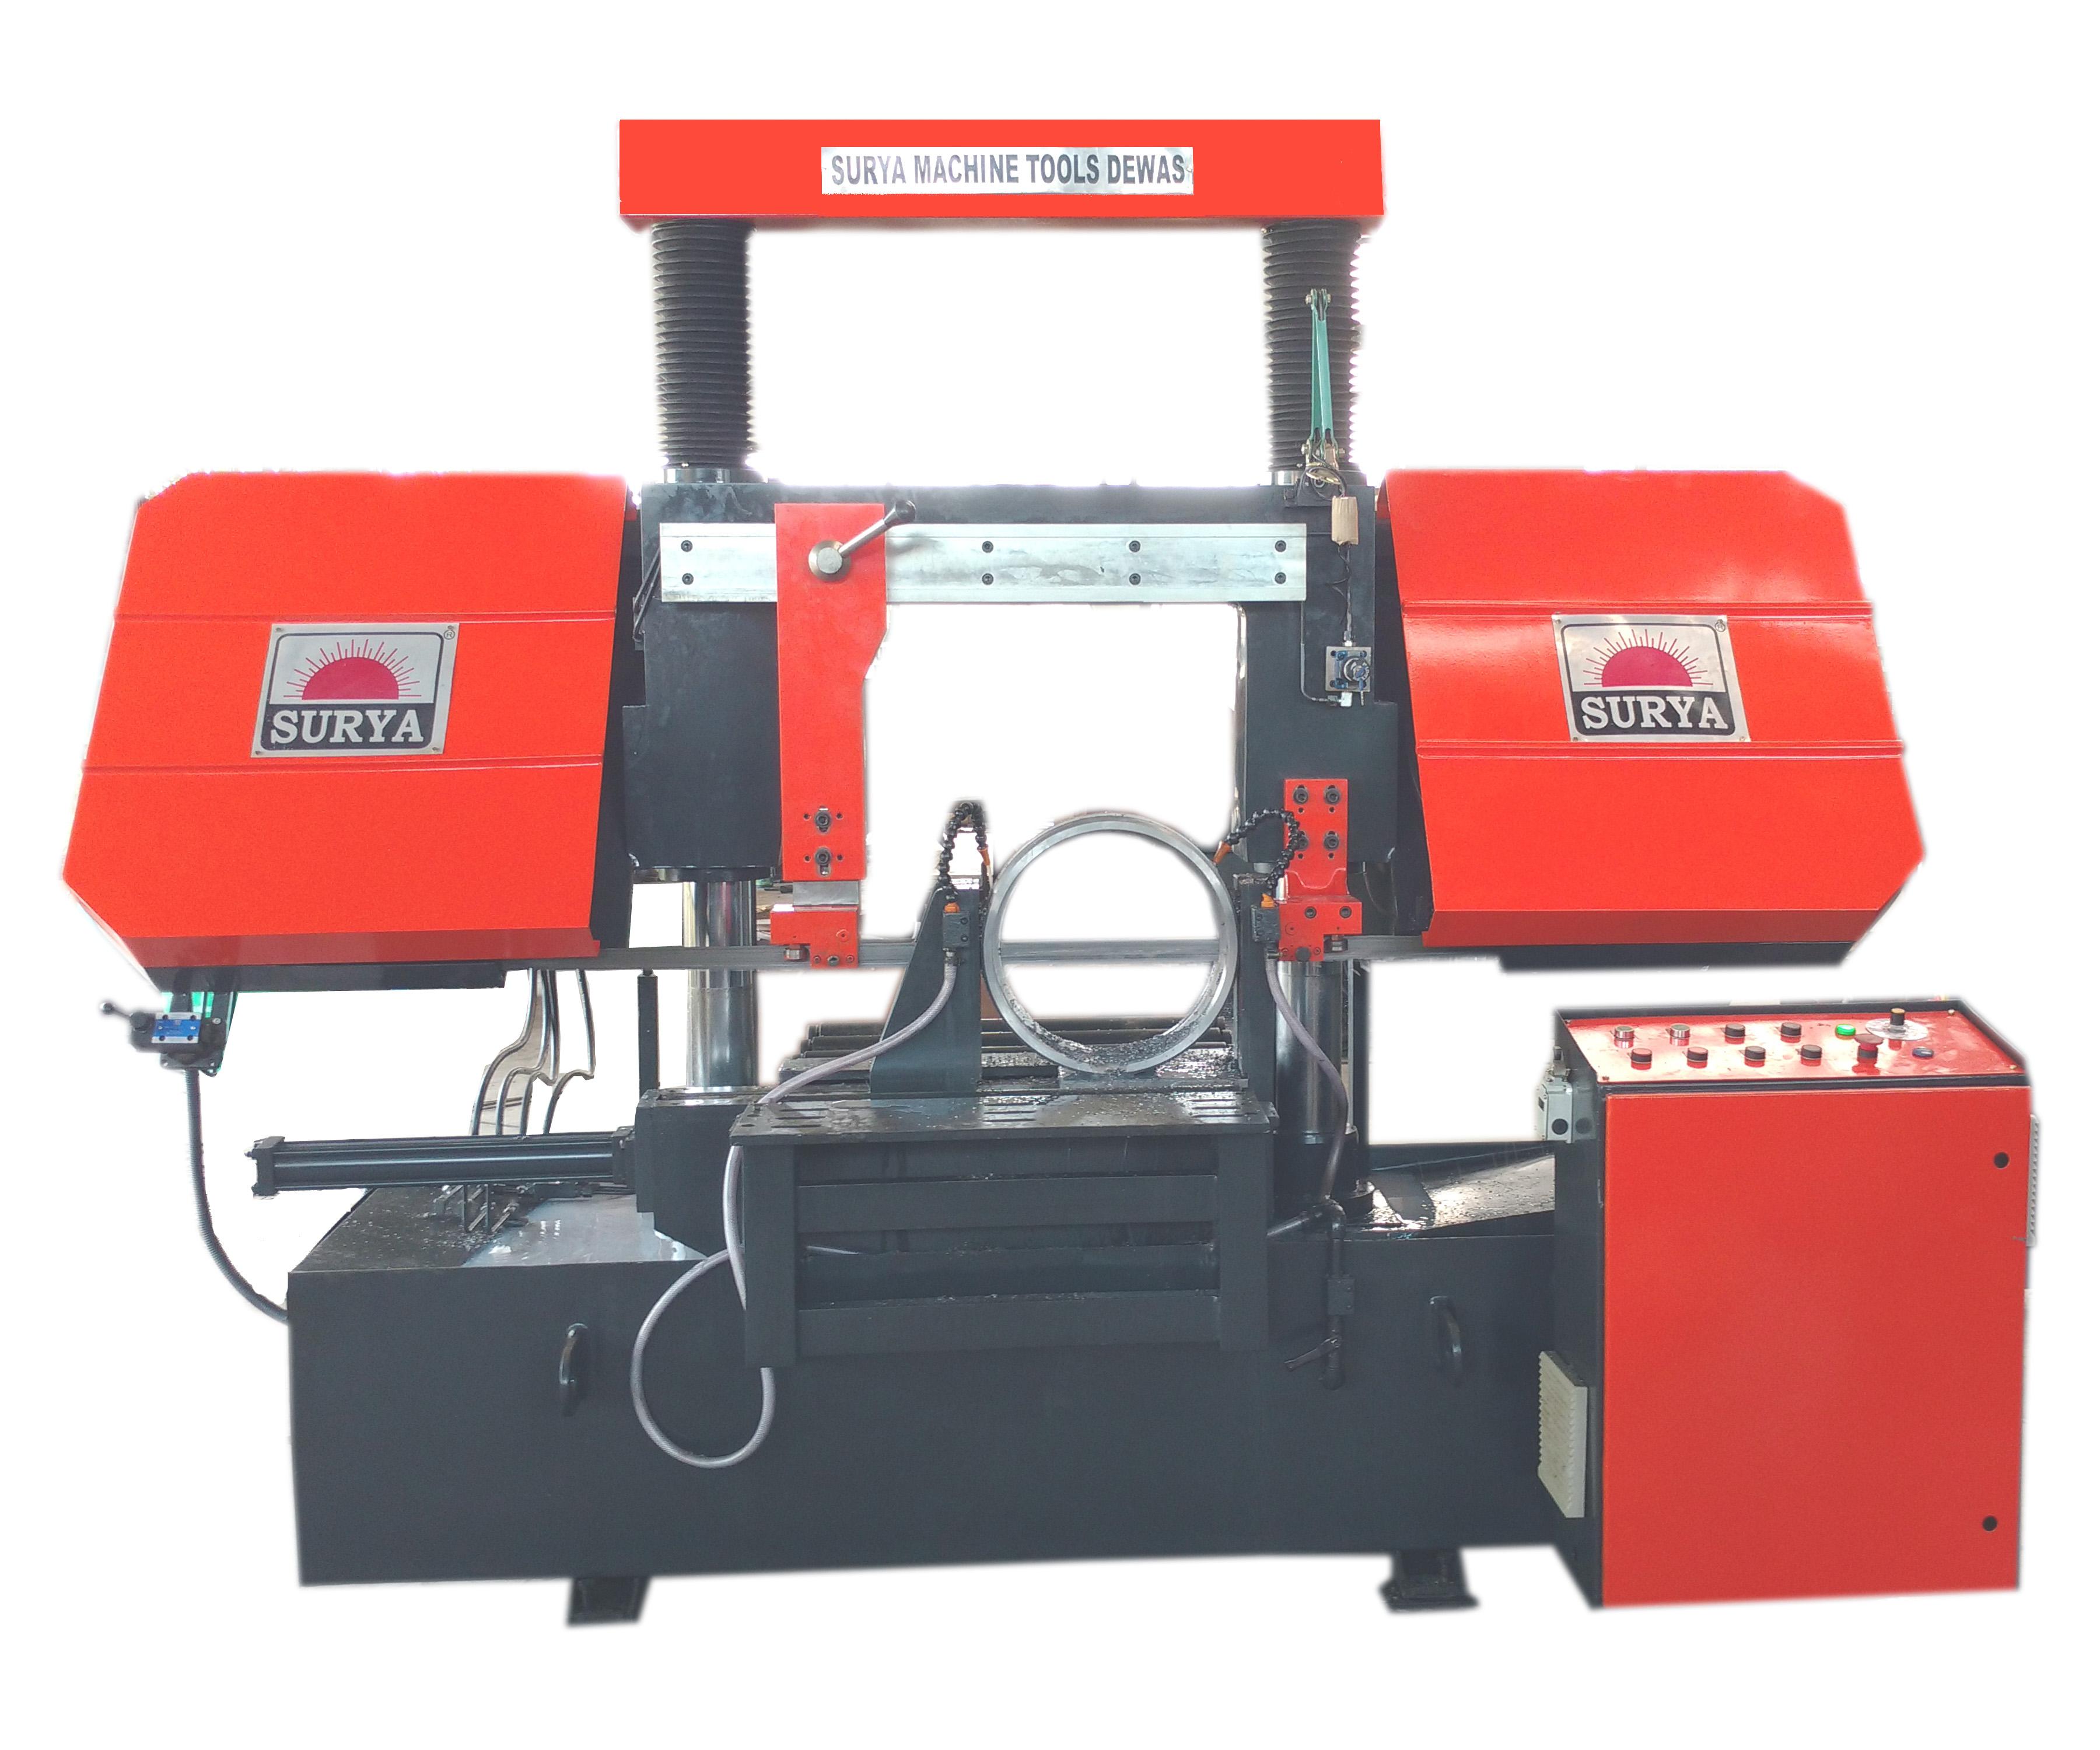 Surya Machine Tools India Pvt Ltd